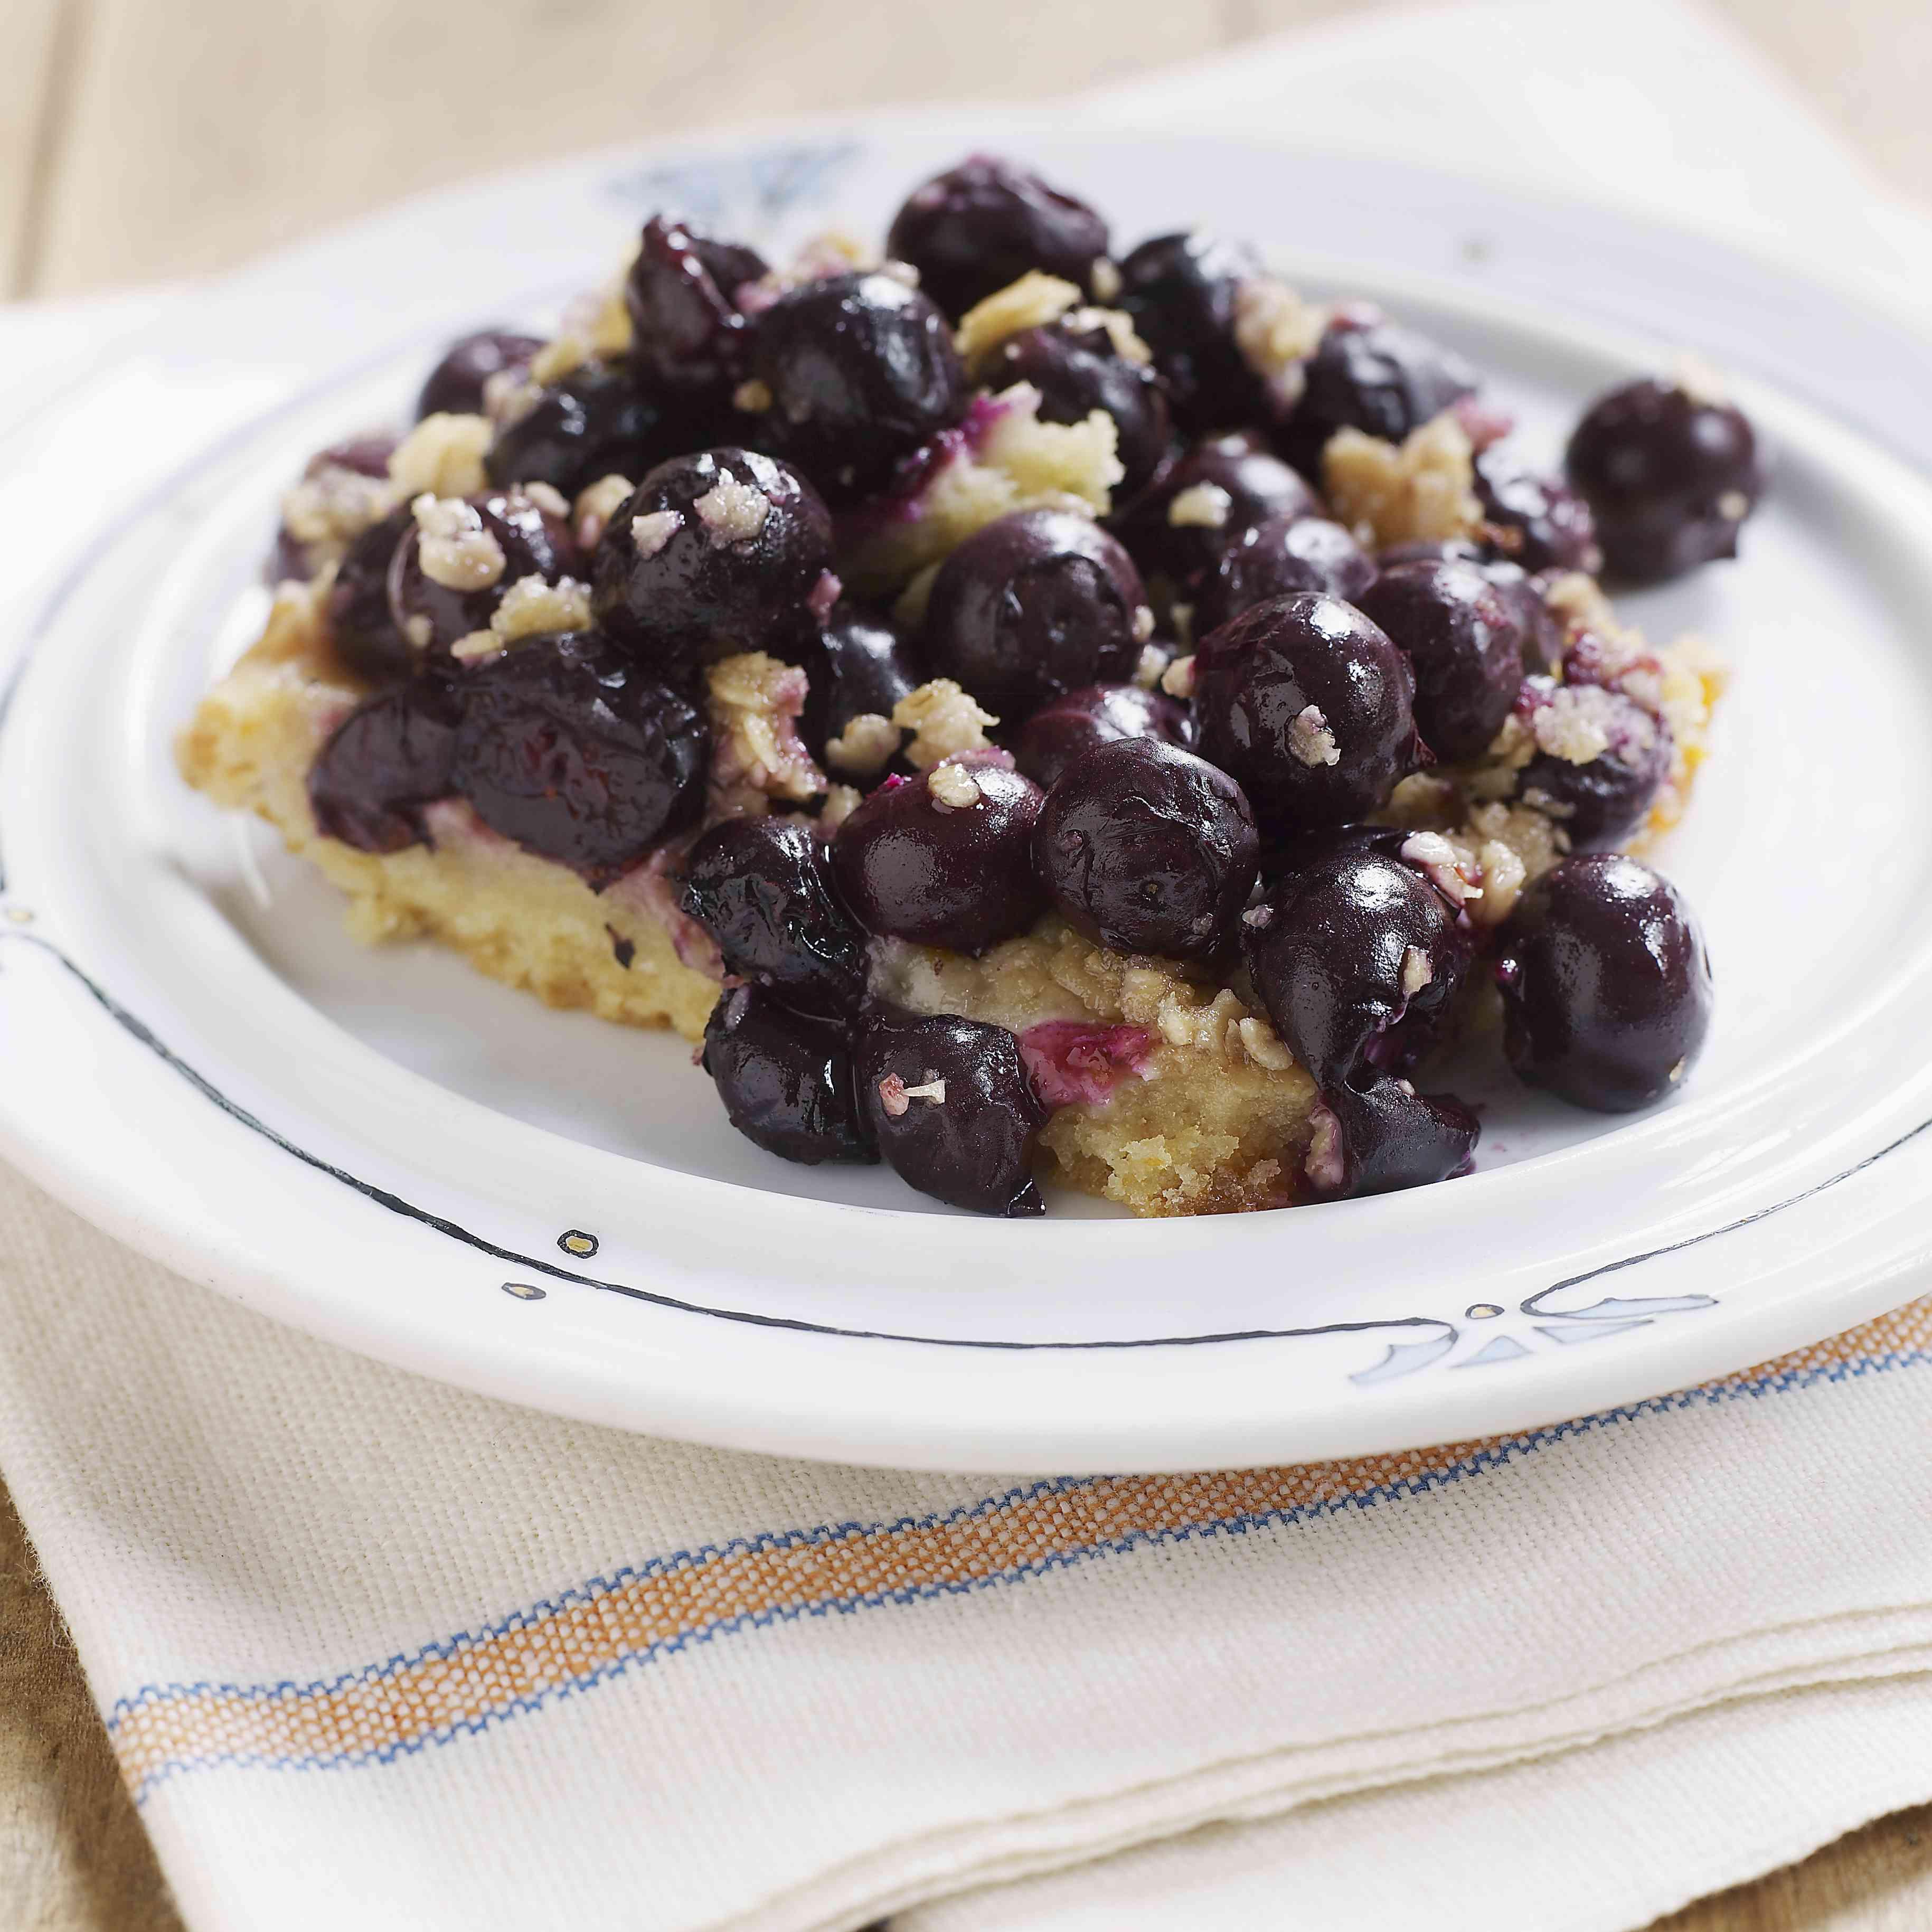 Easy blueberry crunch dessert on a plate